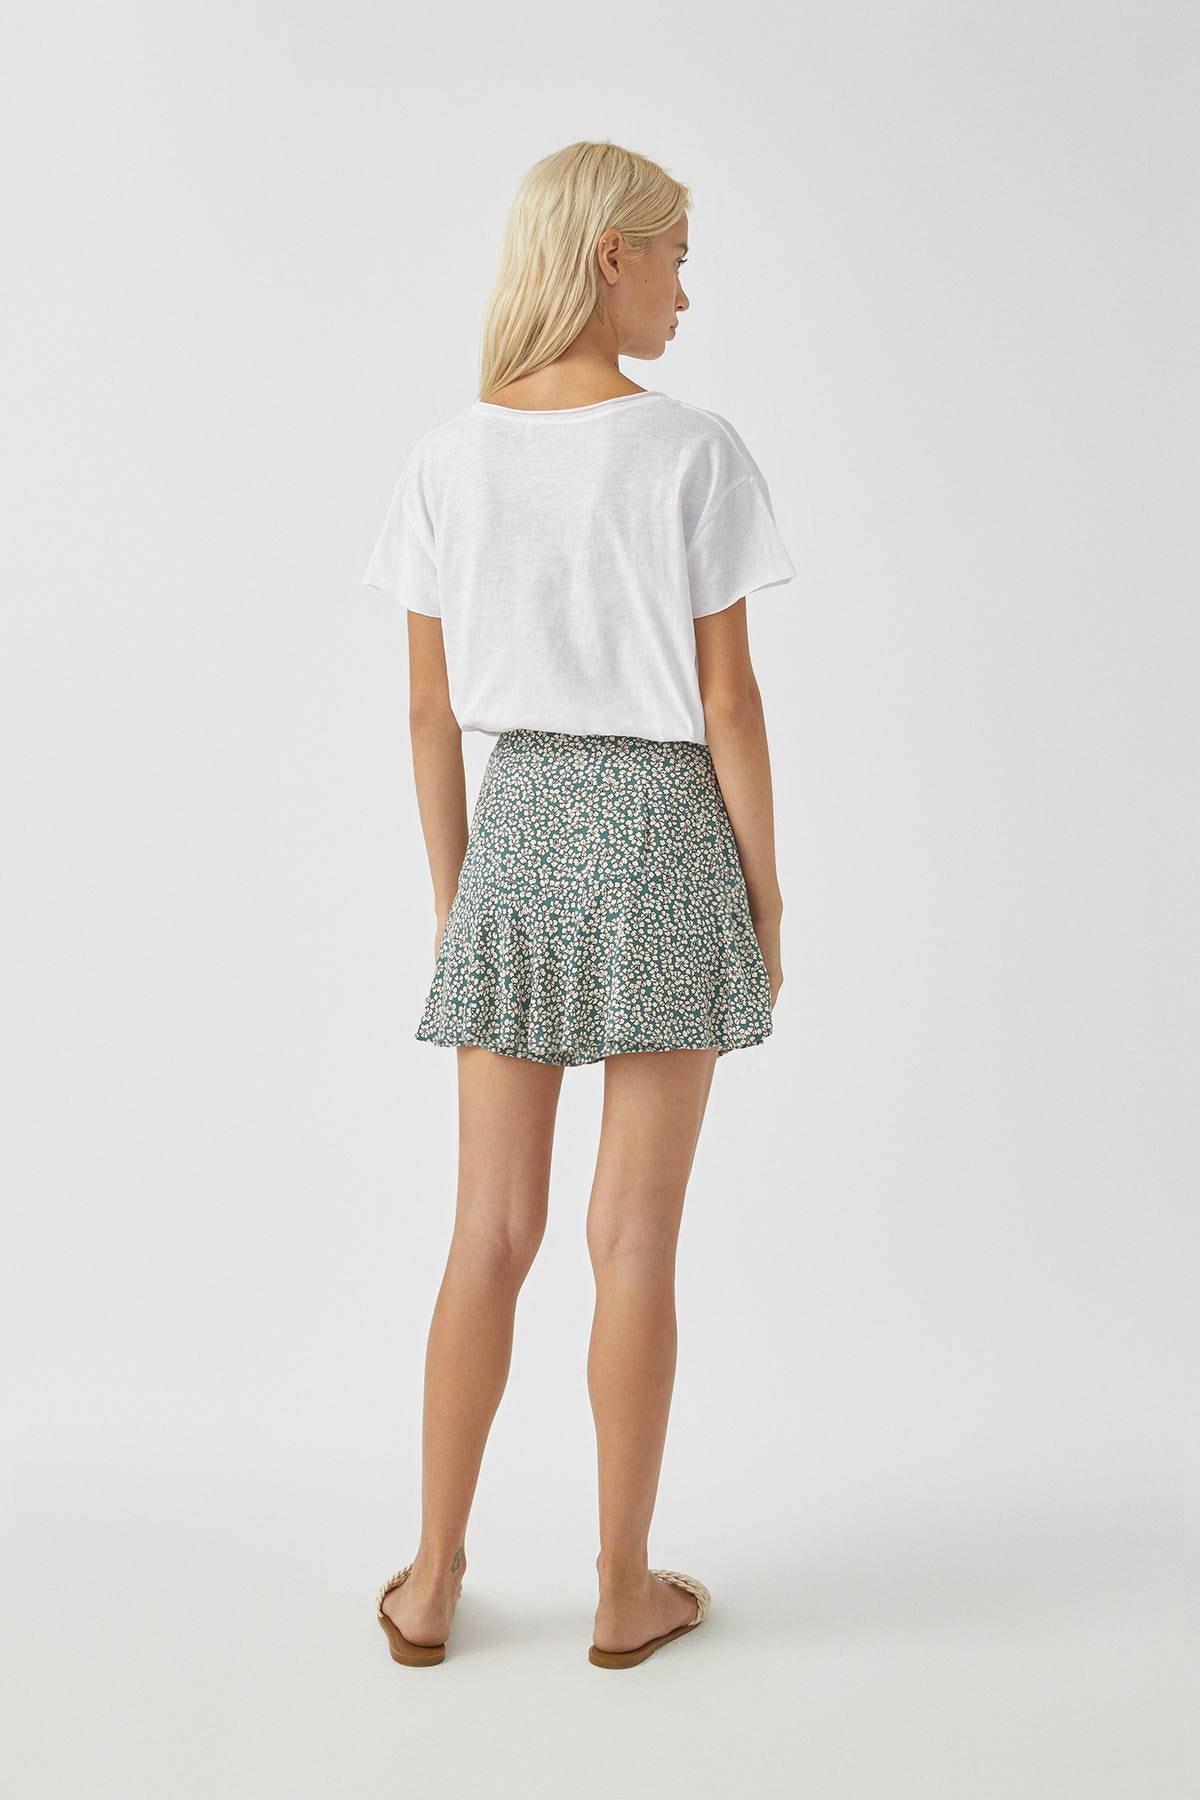 Pull & Bear Kadın Beyaz Biyeli Dikişli Basic T-Shirt 05236307 2